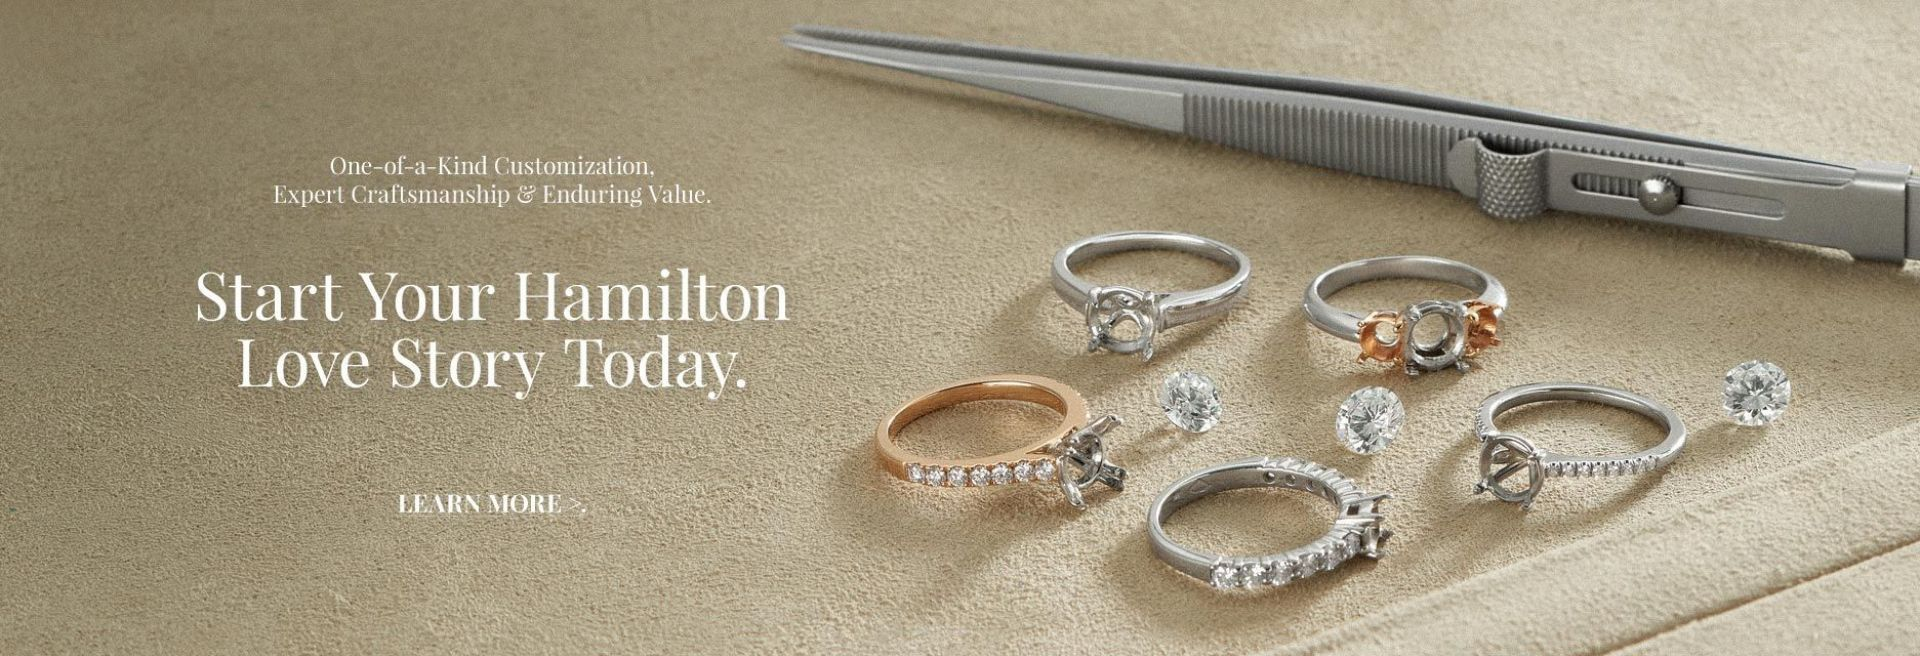 Start Your Hamilton Love Story Today